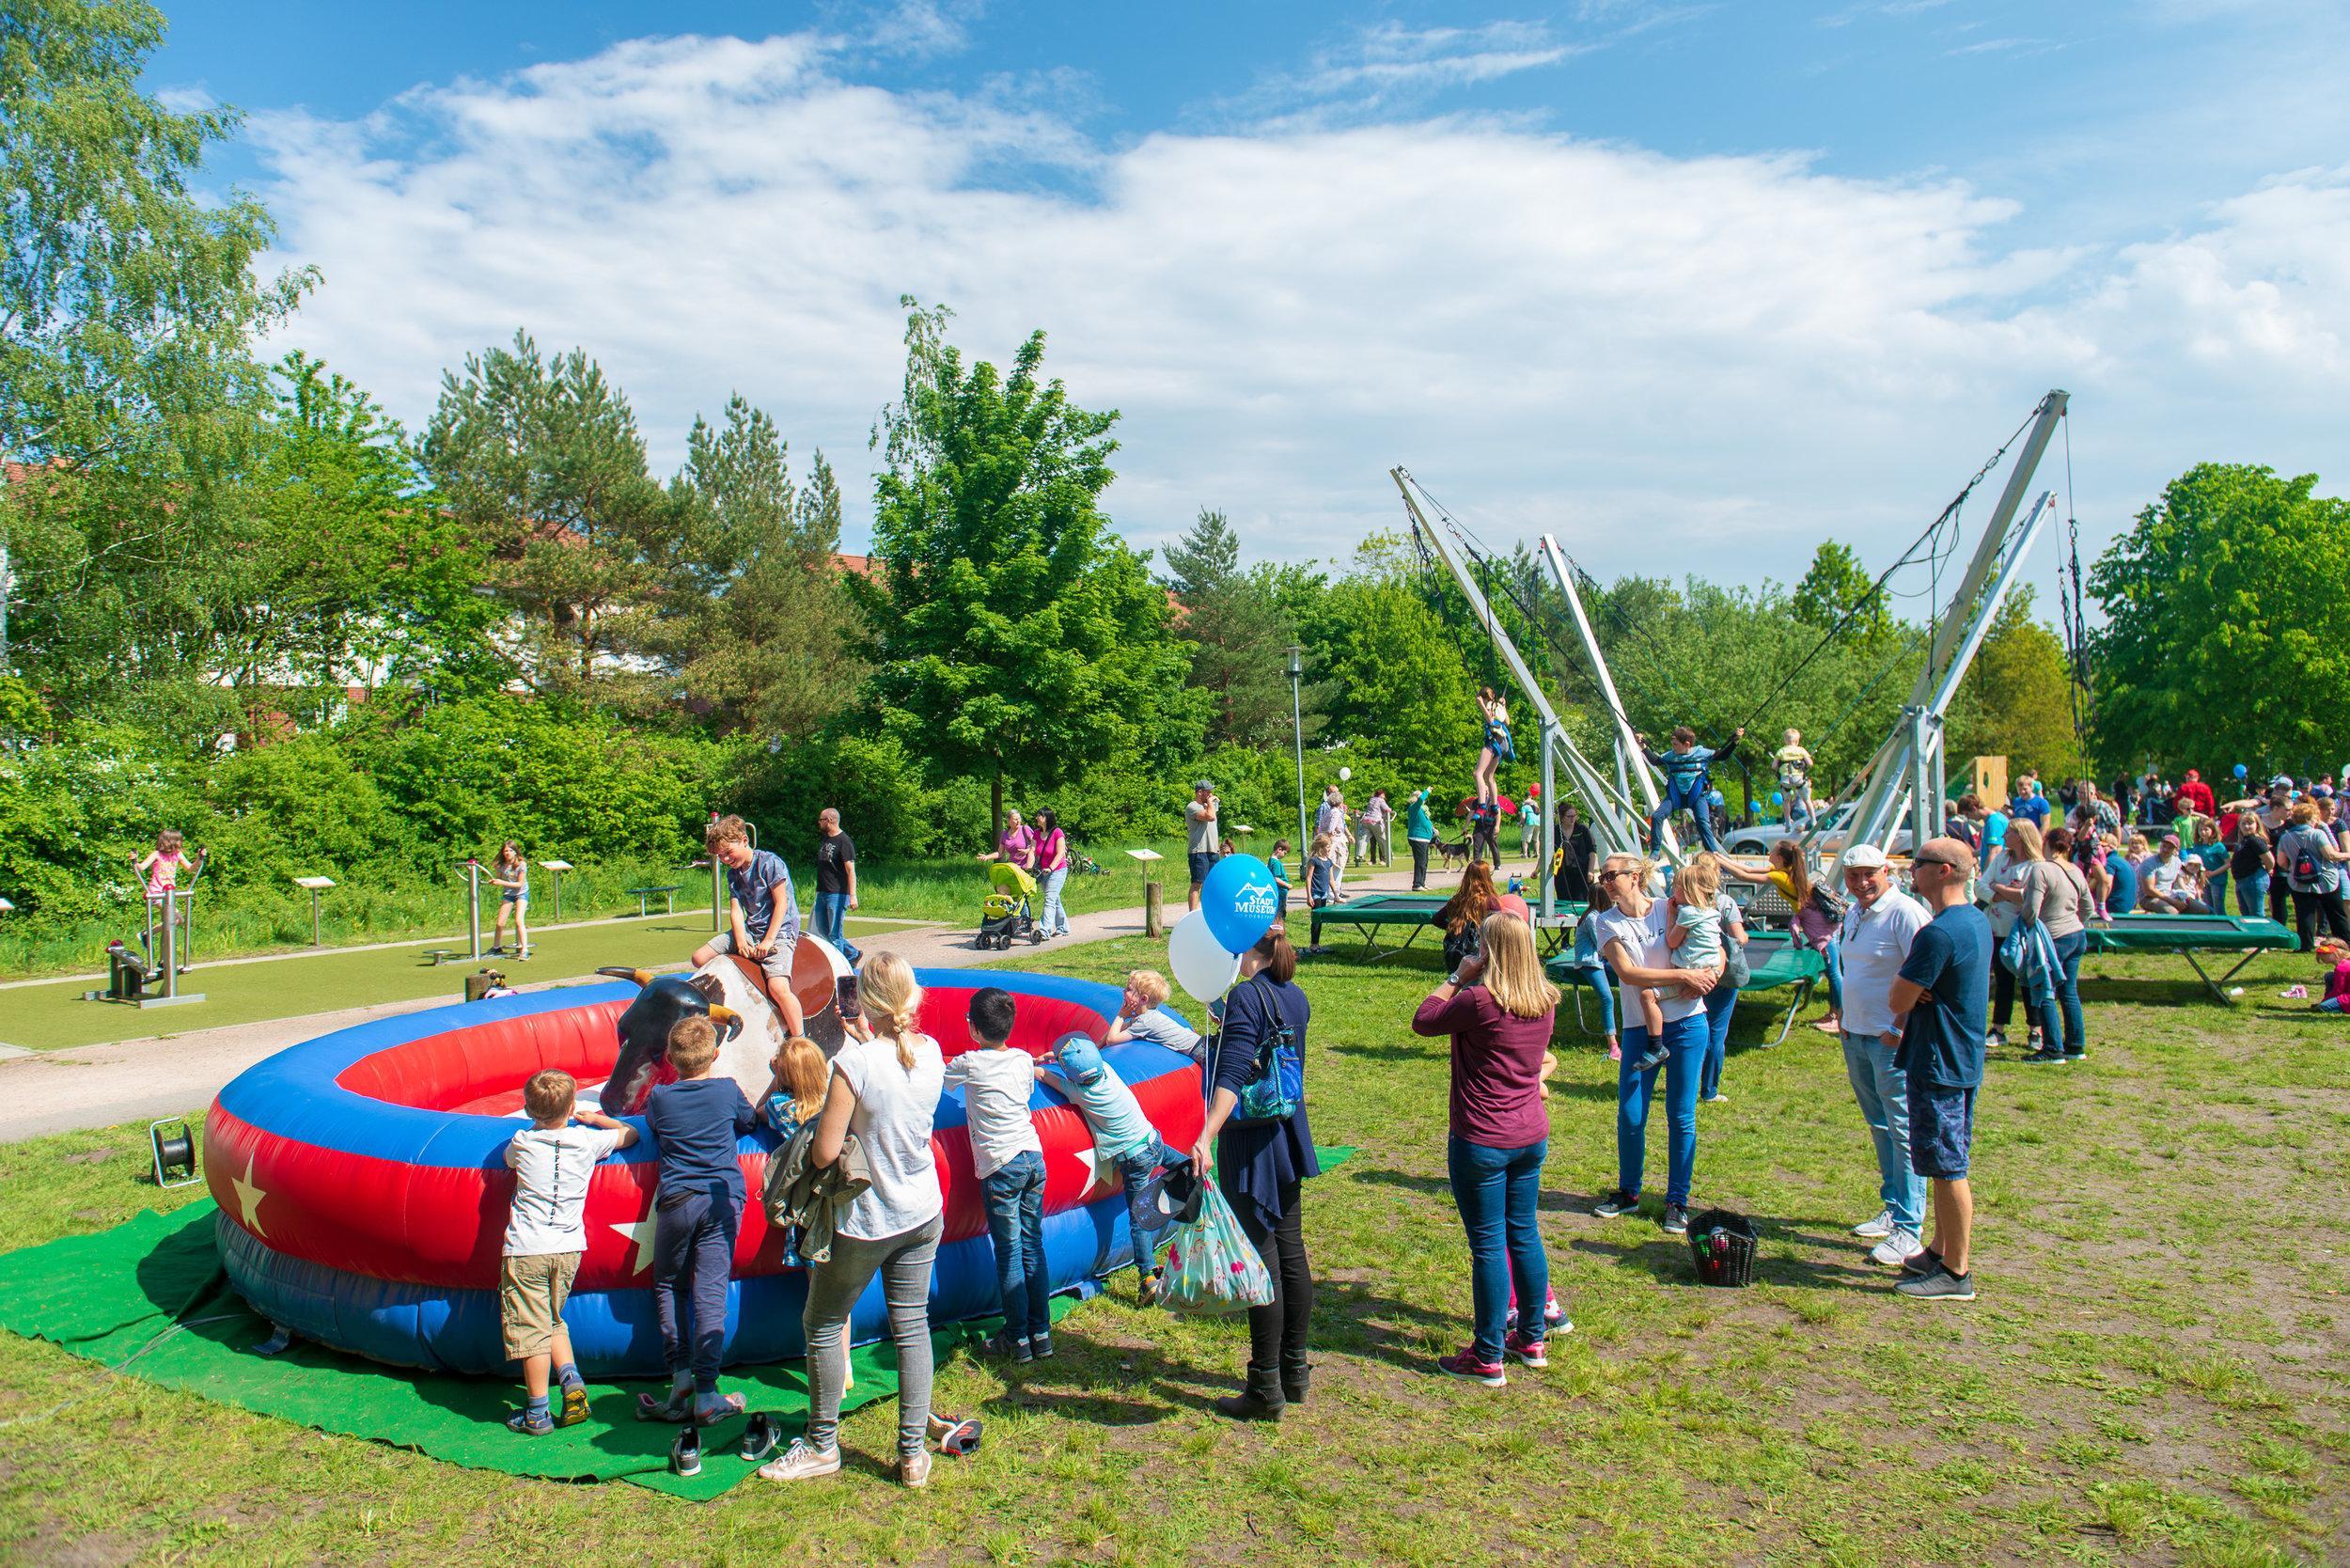 13-Norderstedter-Museumsfest-2019-FWM--XO-Dennys-Mamero-WEB-27.jpg